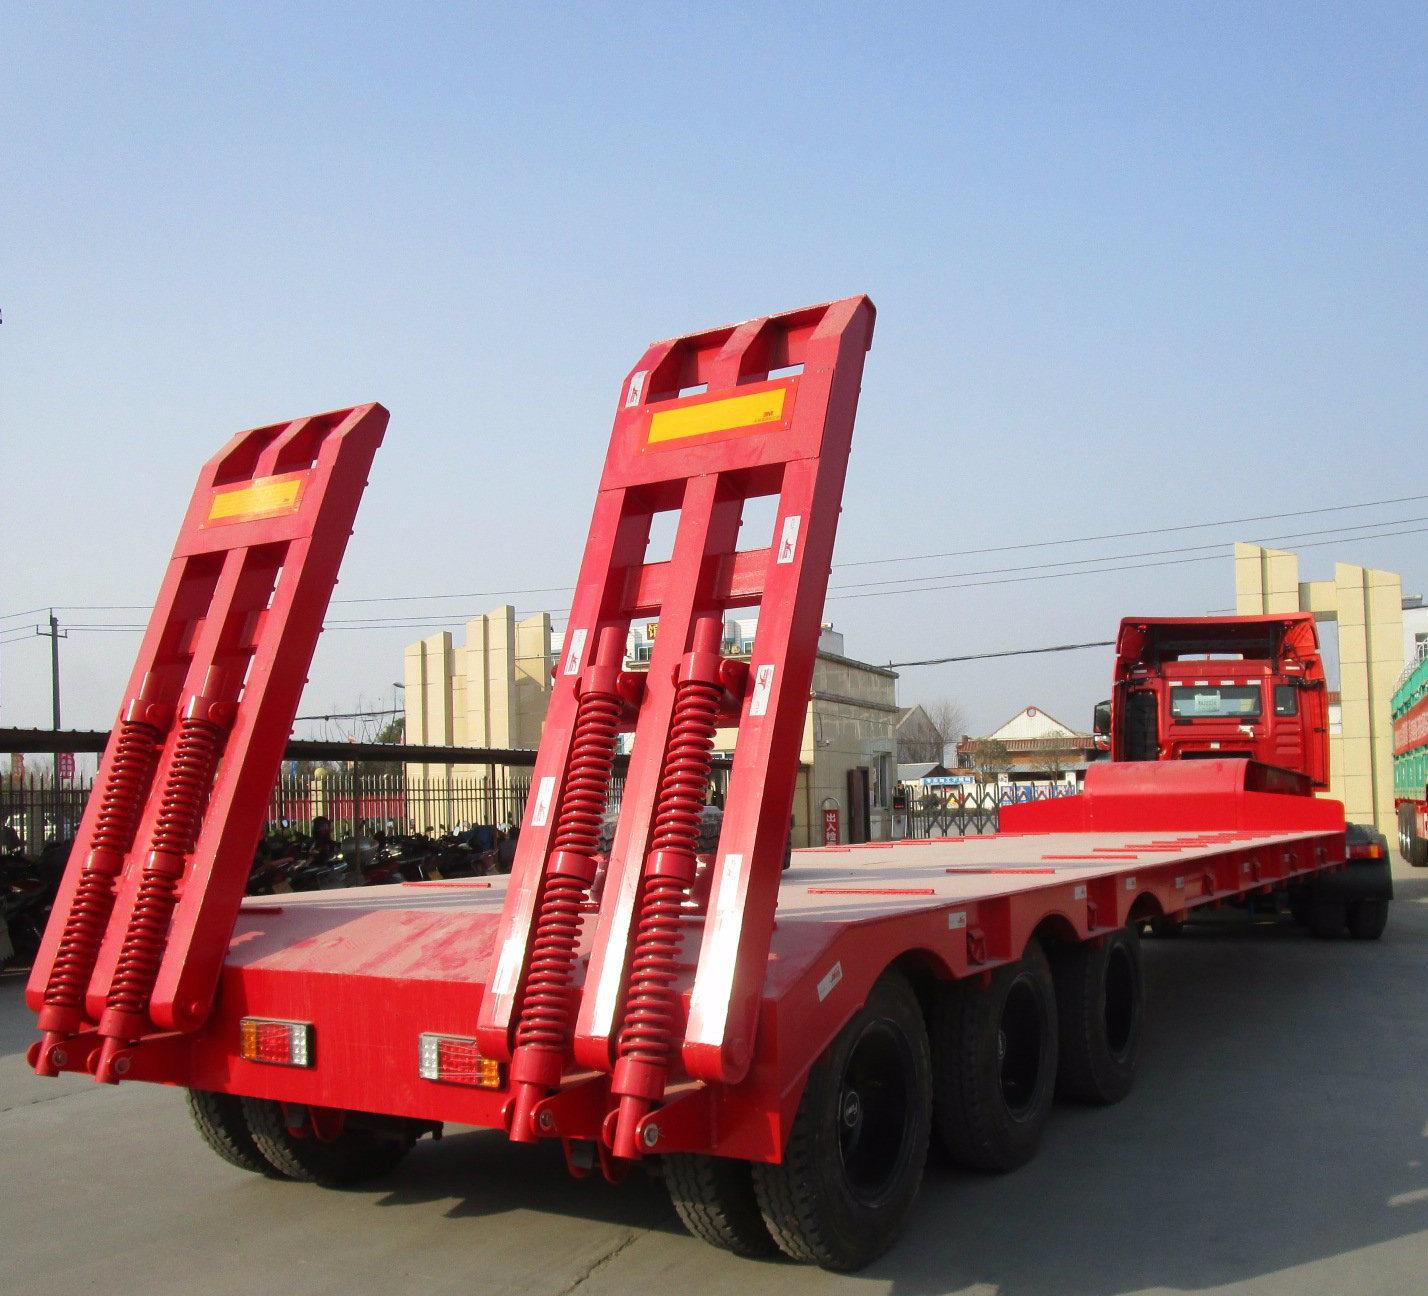 Gooseneck Flatbed Semitrailer with Ladder